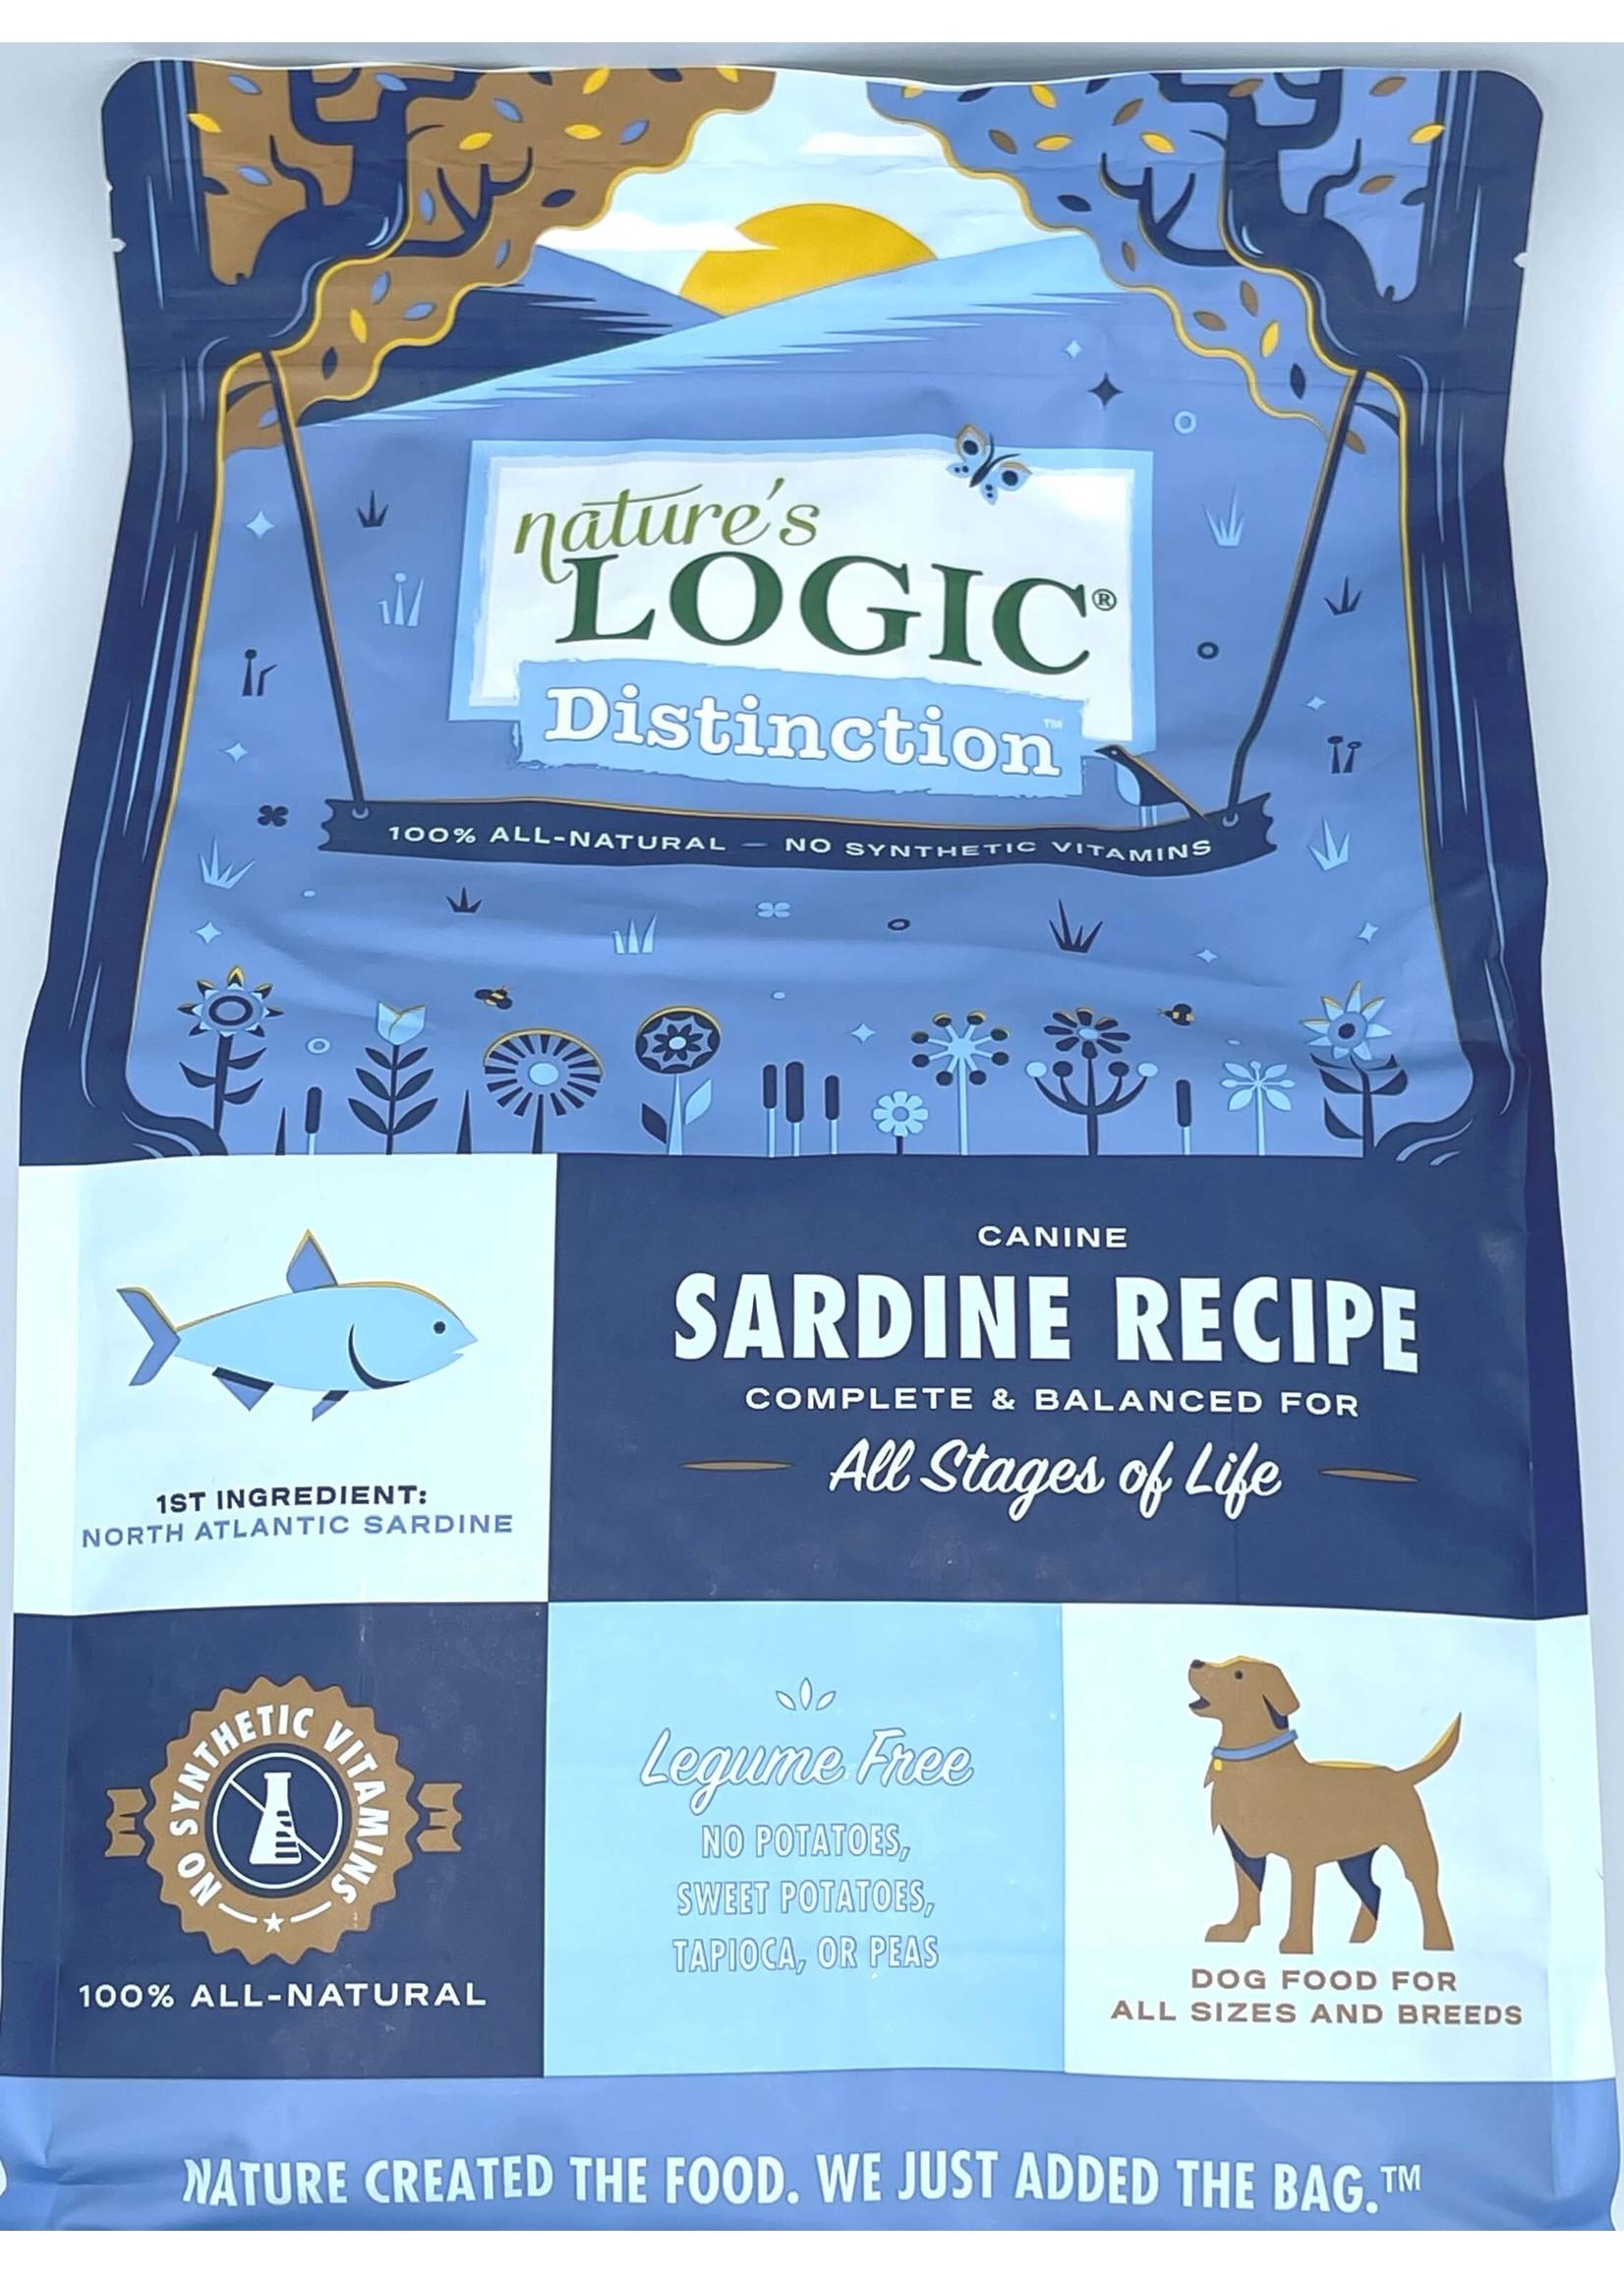 Nature's Logic Nature's Logic Distinction Sardine Recipe Dog Food 4.4lb Bag